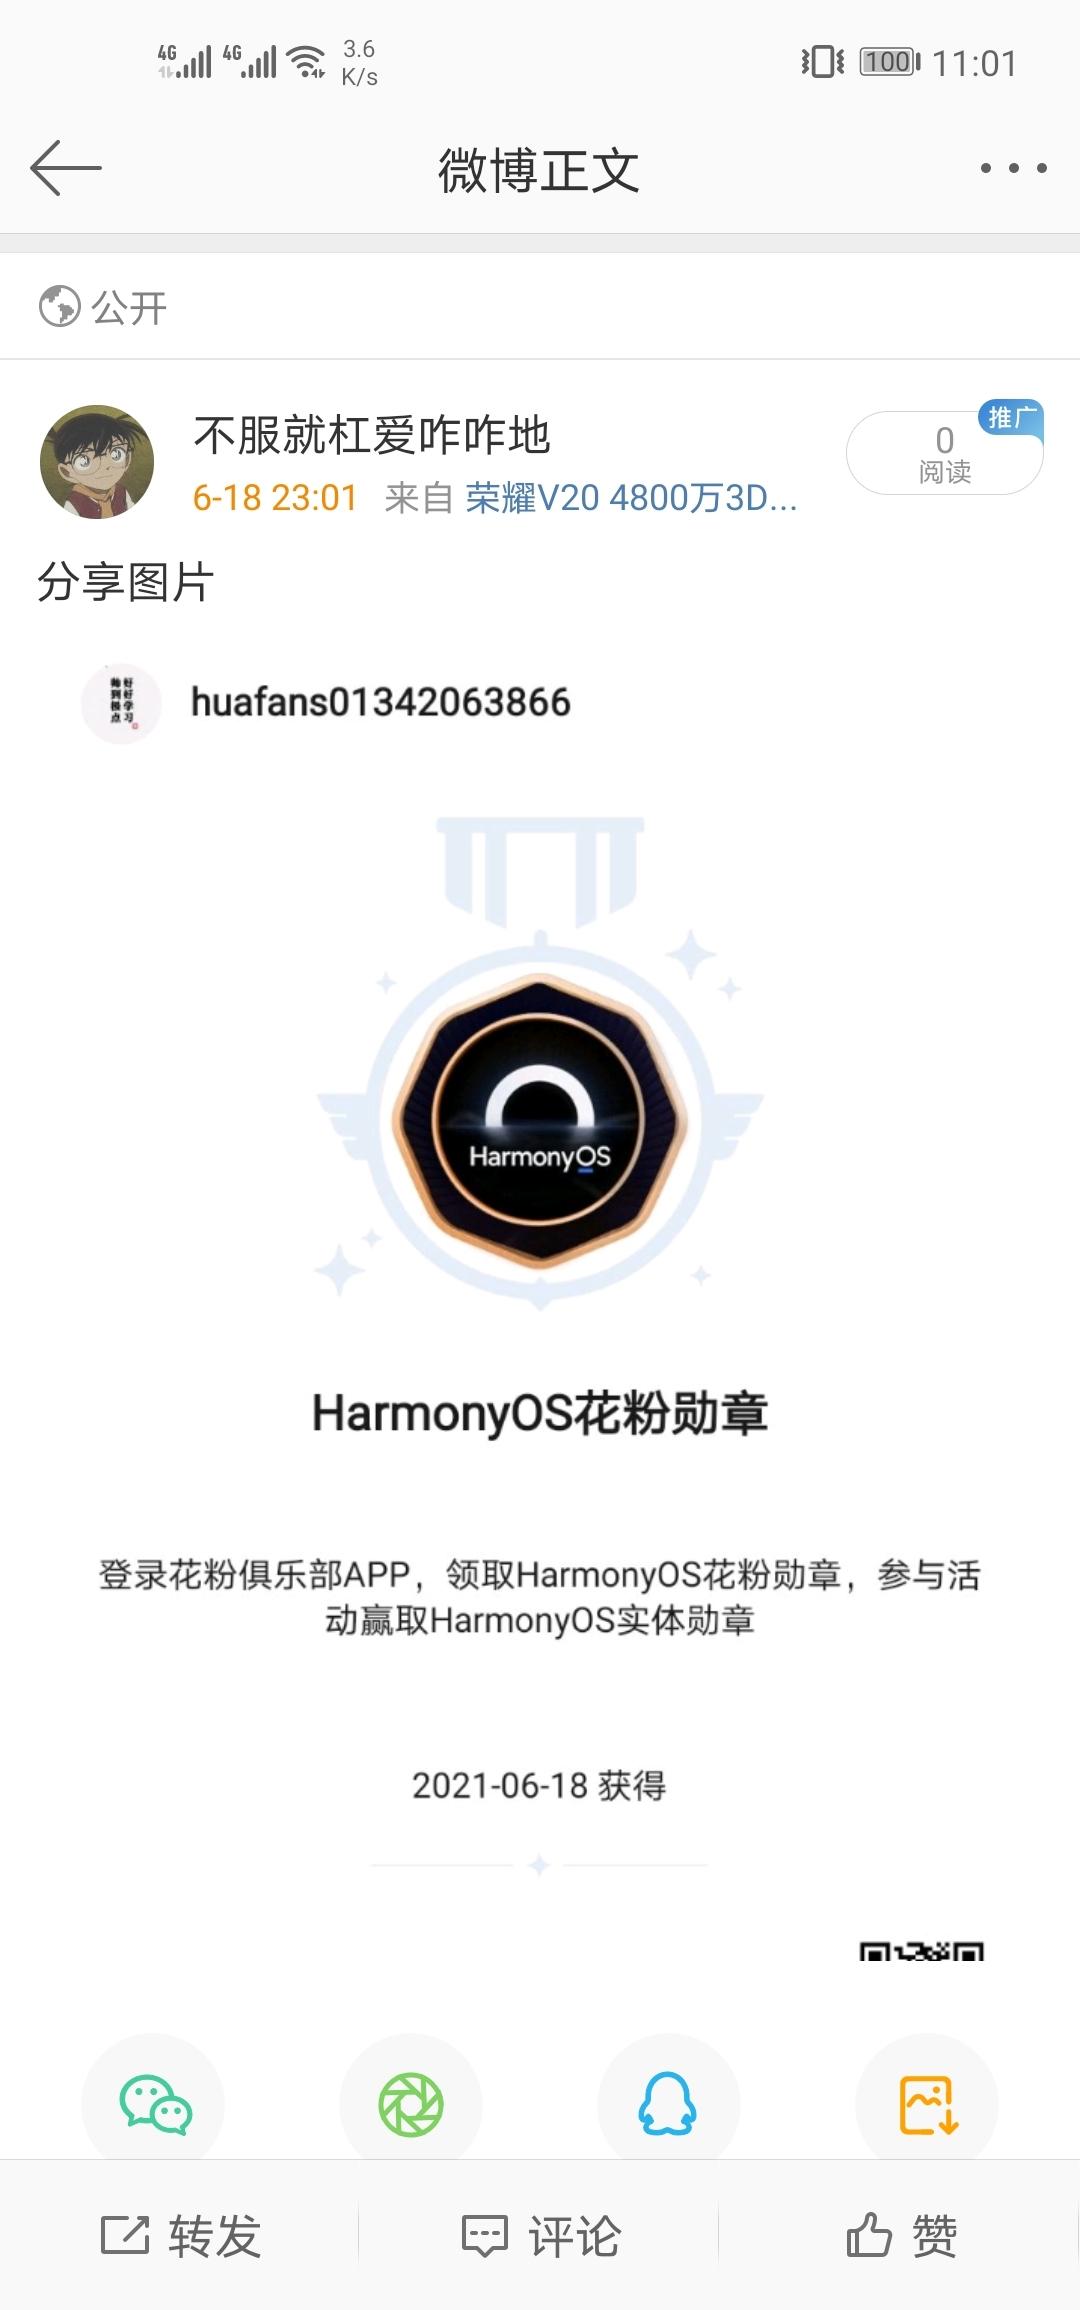 Screenshot_20210618_230114_com.sina.weibo.jpg